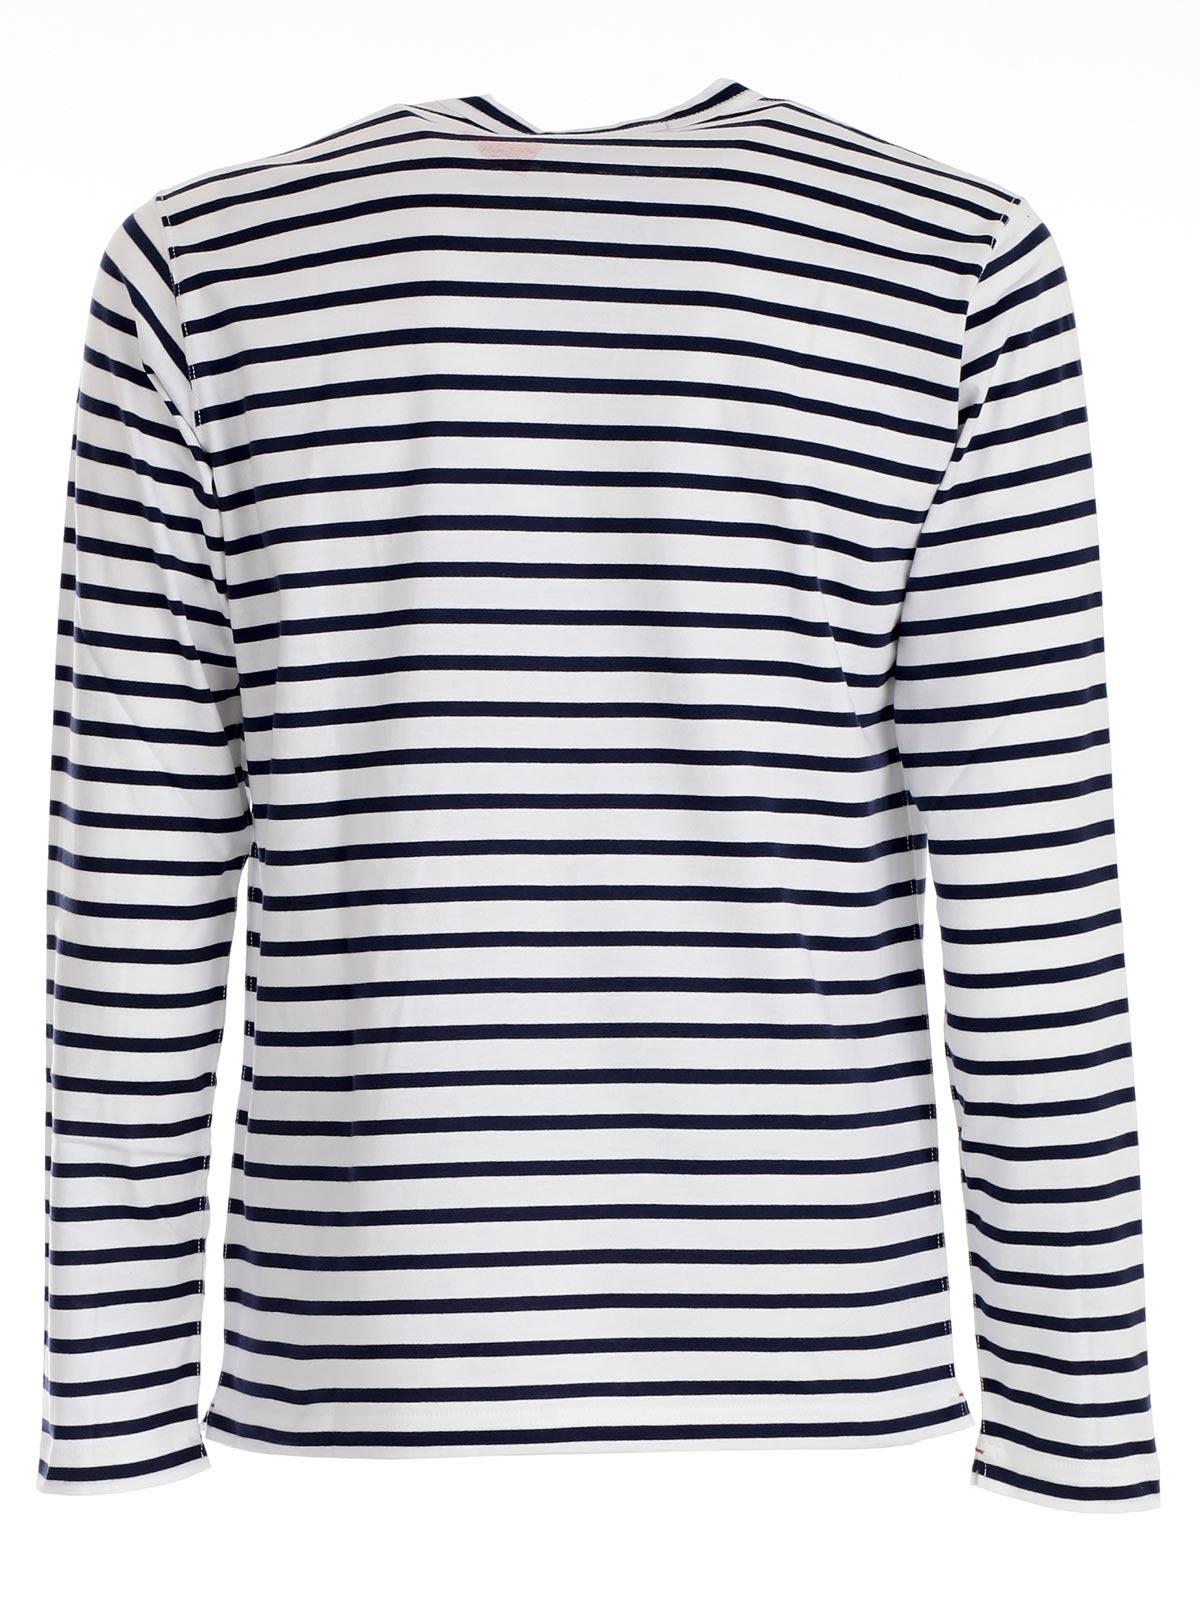 TOPWEAR - Sweatshirts Junya Watanabe Very Cheap Hn9bv